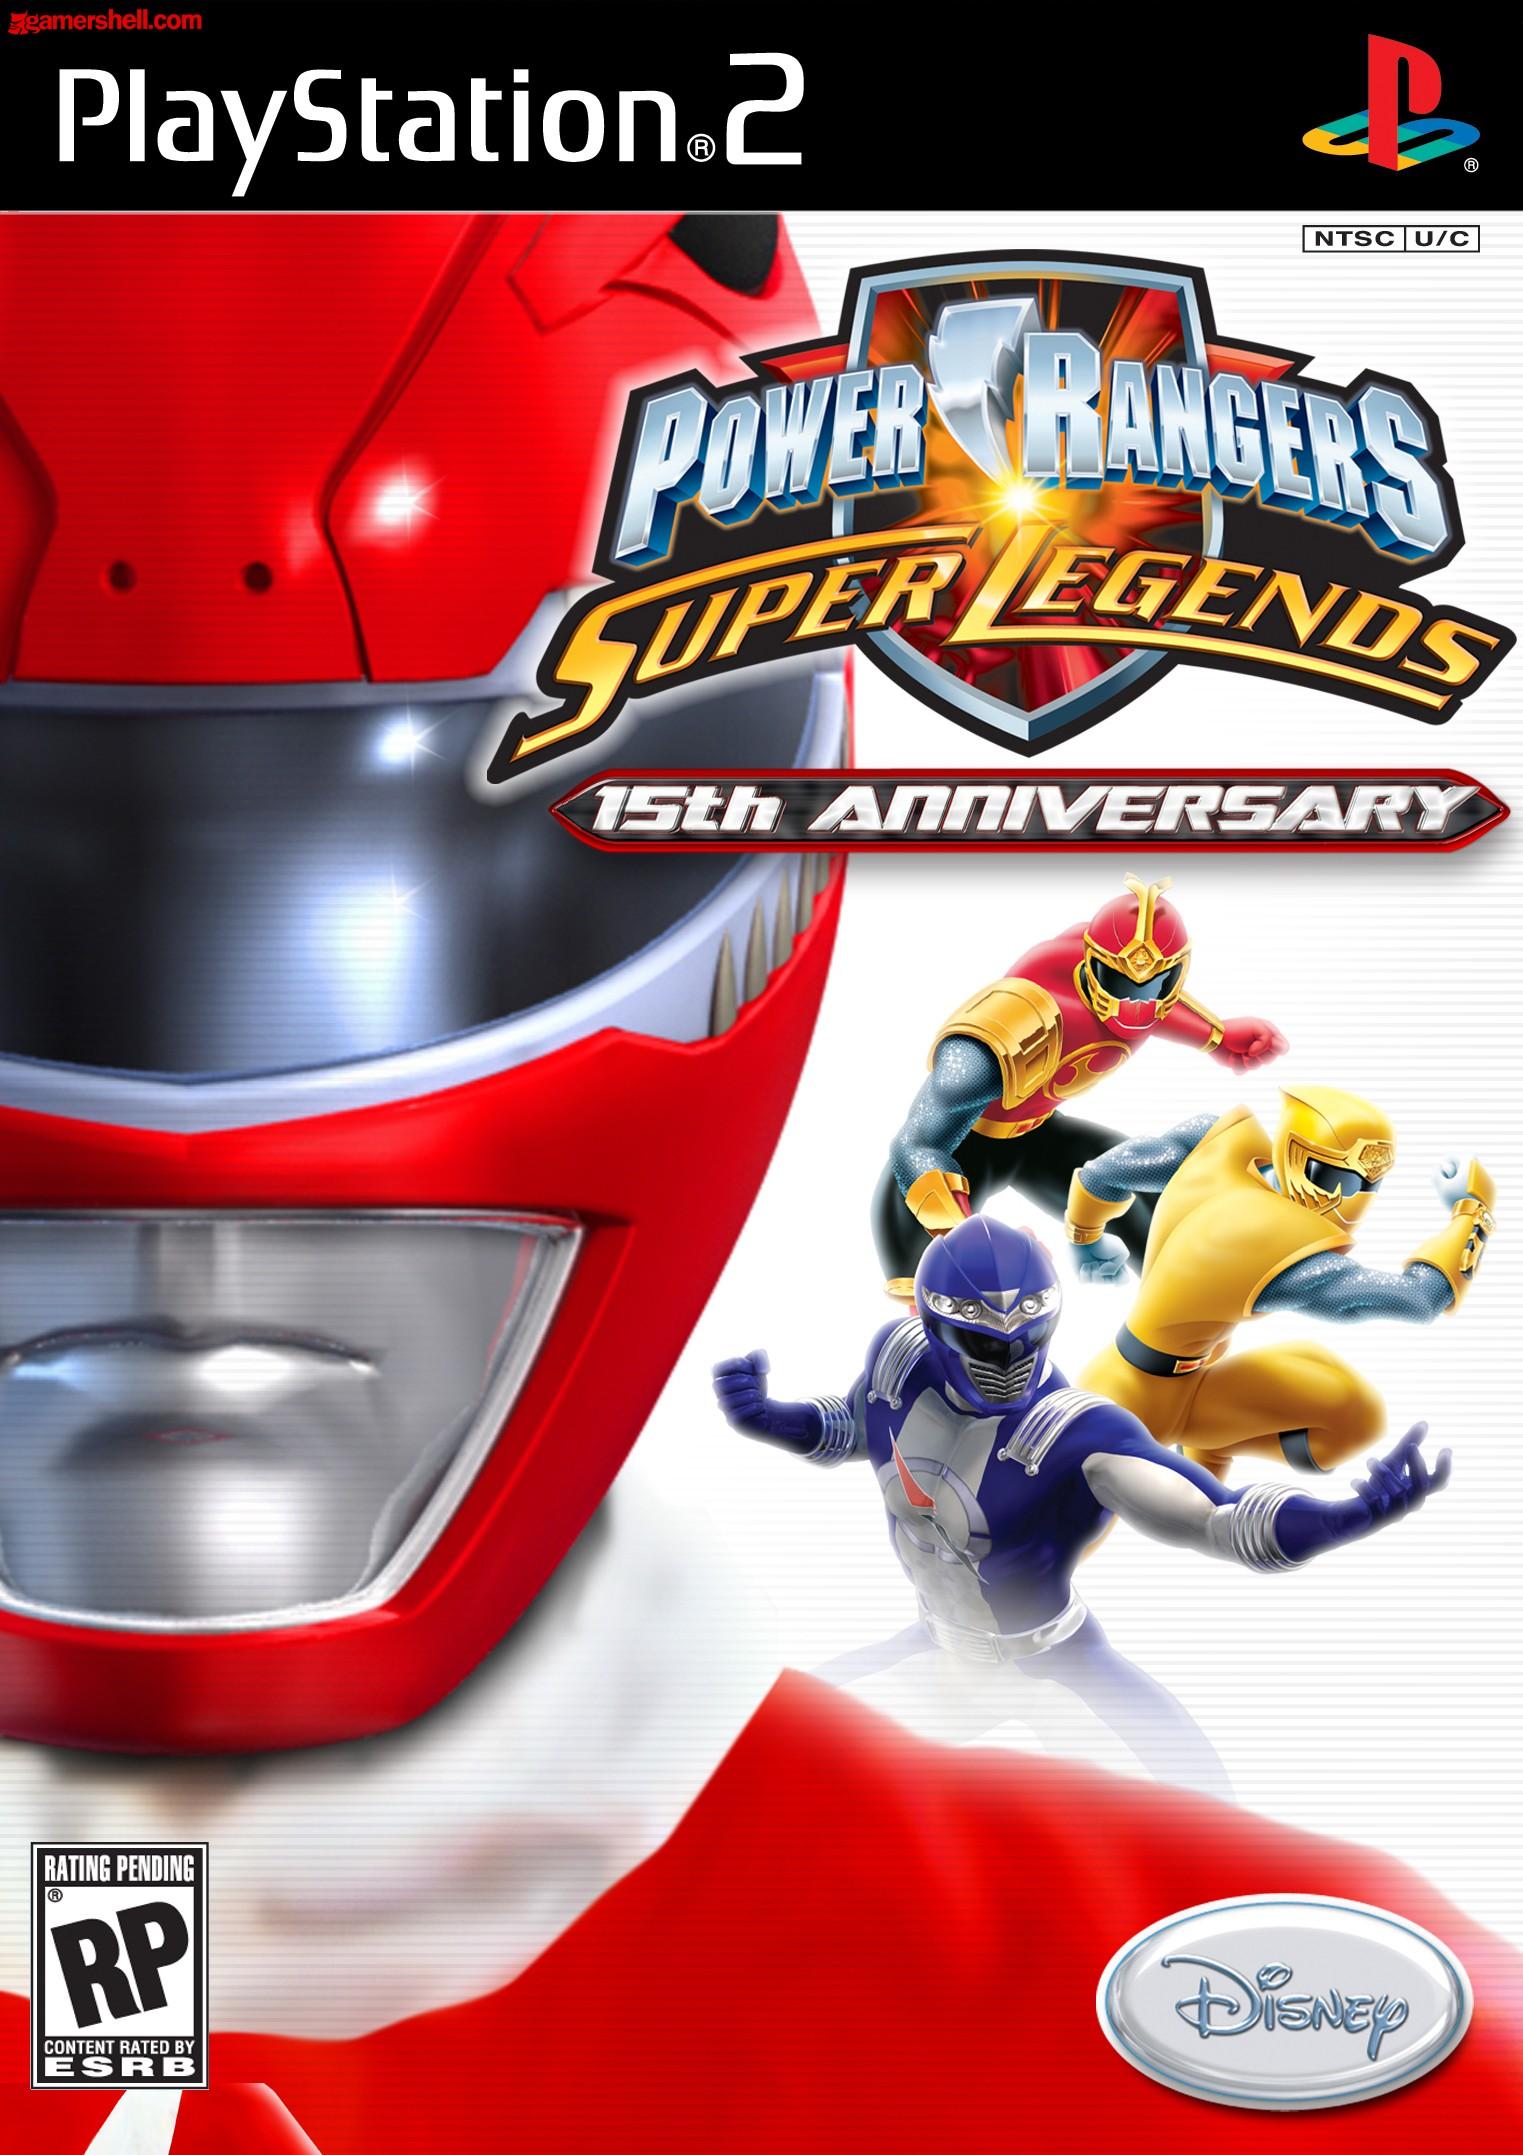 Power rangers super legends free download for pc fullgamesforpc - Power rangers ryukendo games free download ...